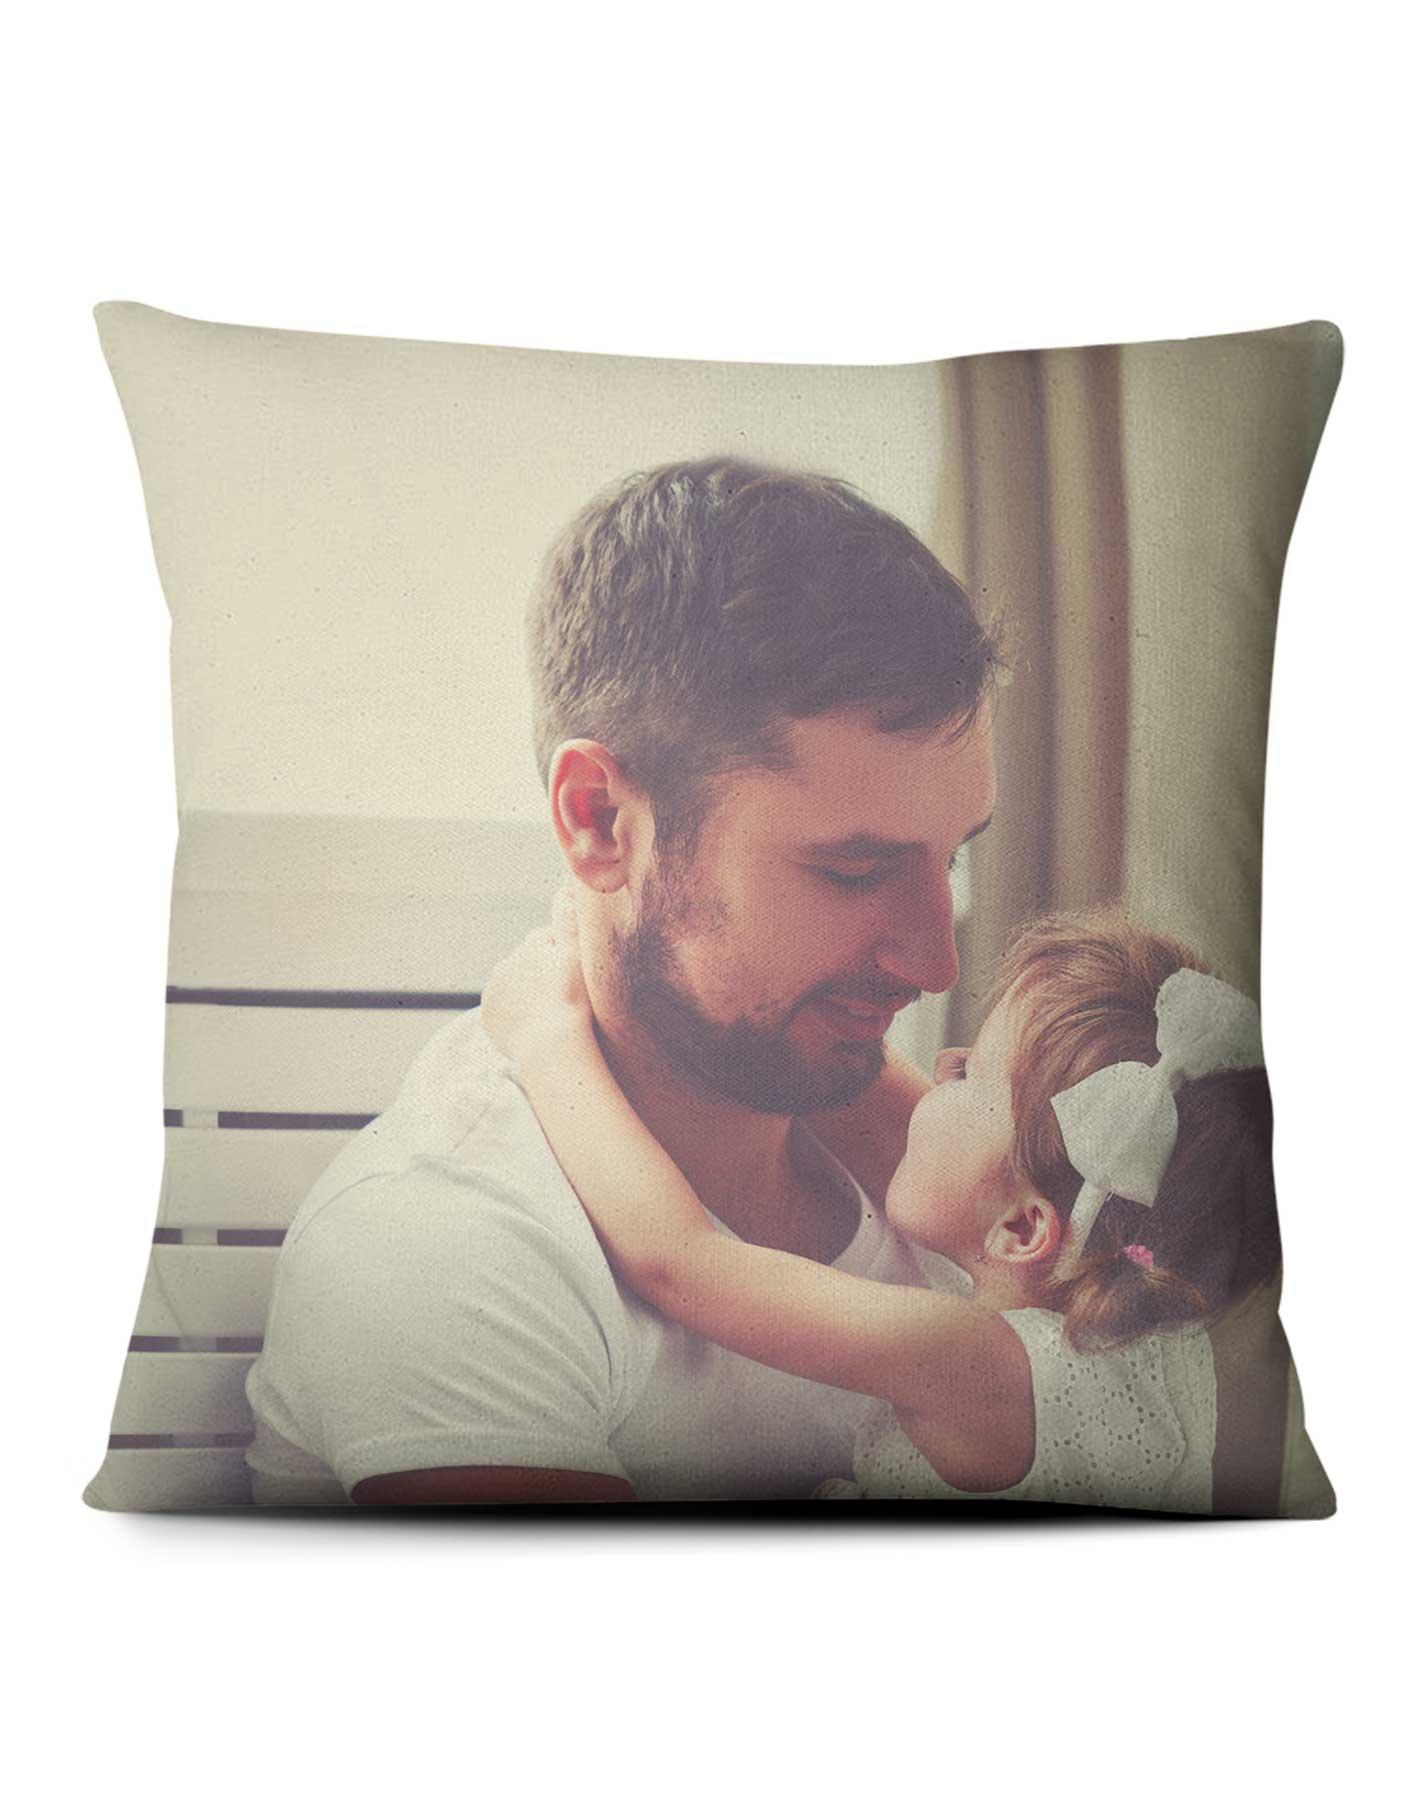 full size photo custom throw pillow easy to create today